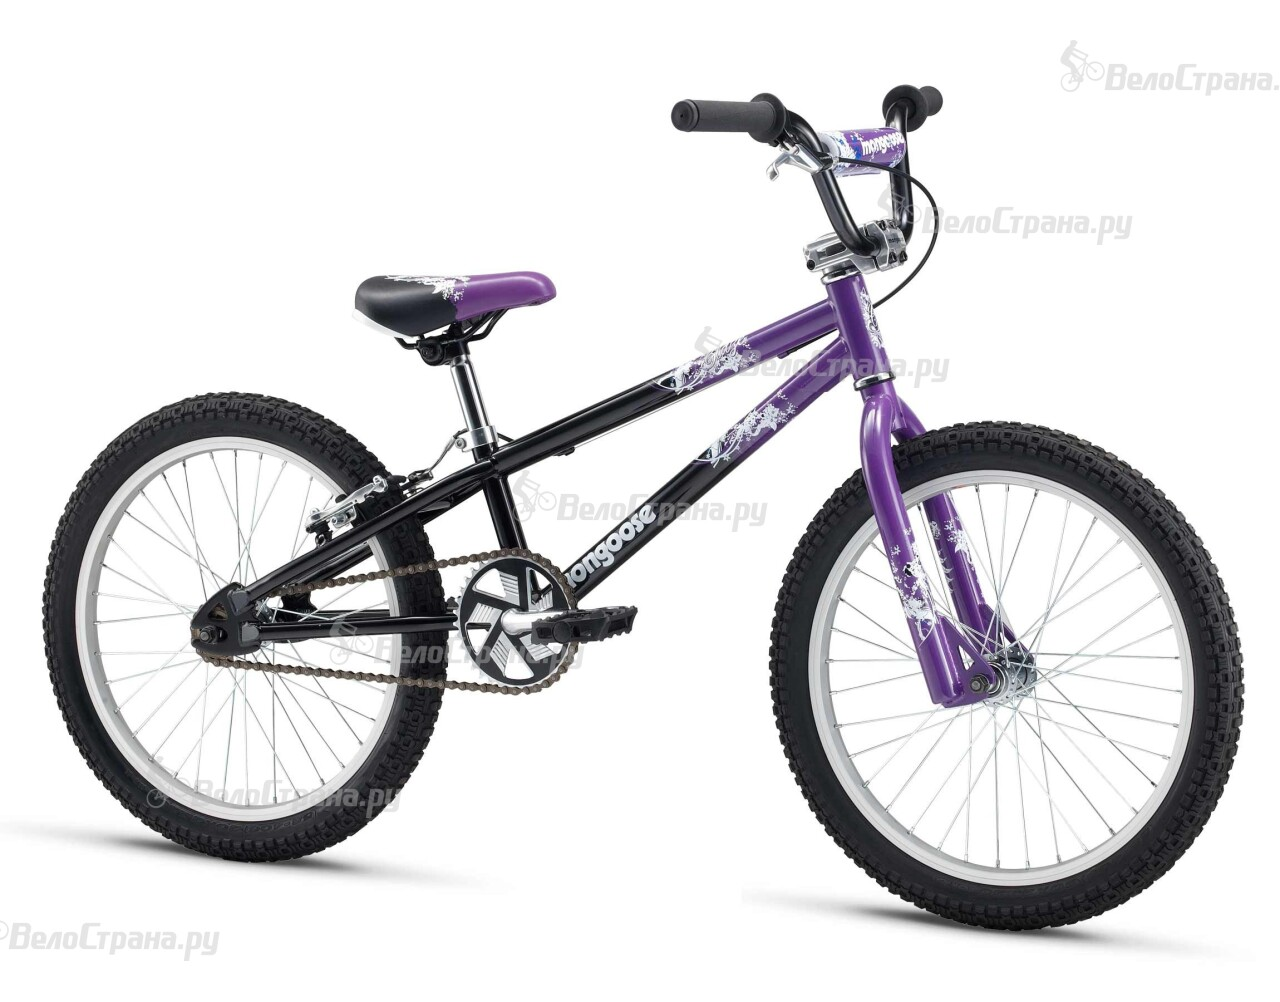 все цены на Велосипед Mongoose Meteore Sport 29'R (2013) онлайн